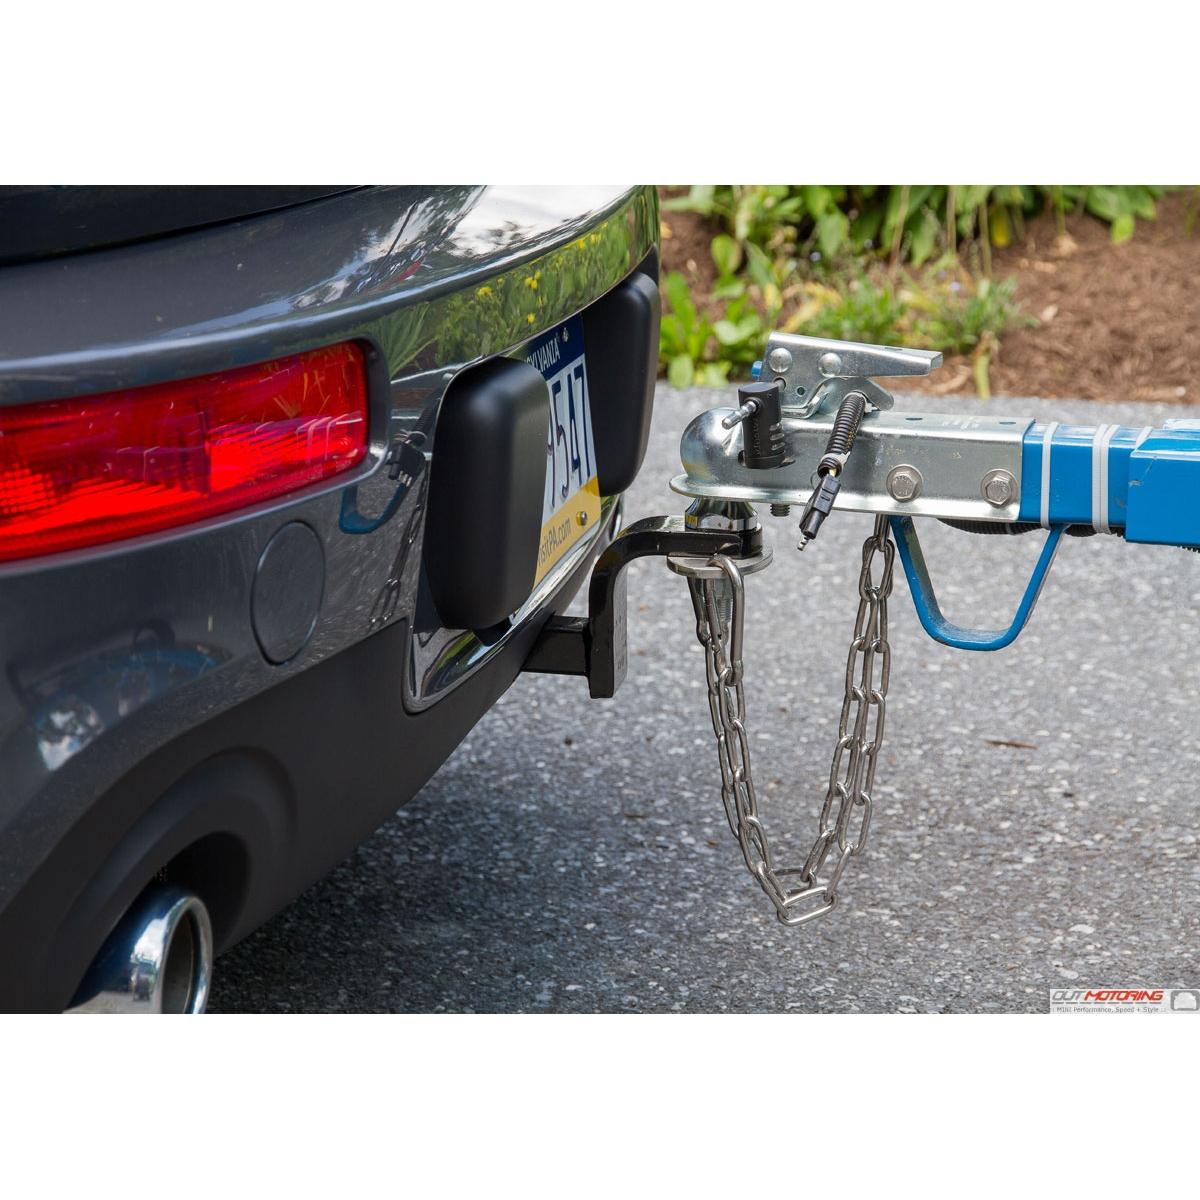 Best Bike Rack For Mini Cooper: MINI F54 Clubman Towing Hitch Bike Rack: Trailer Mount